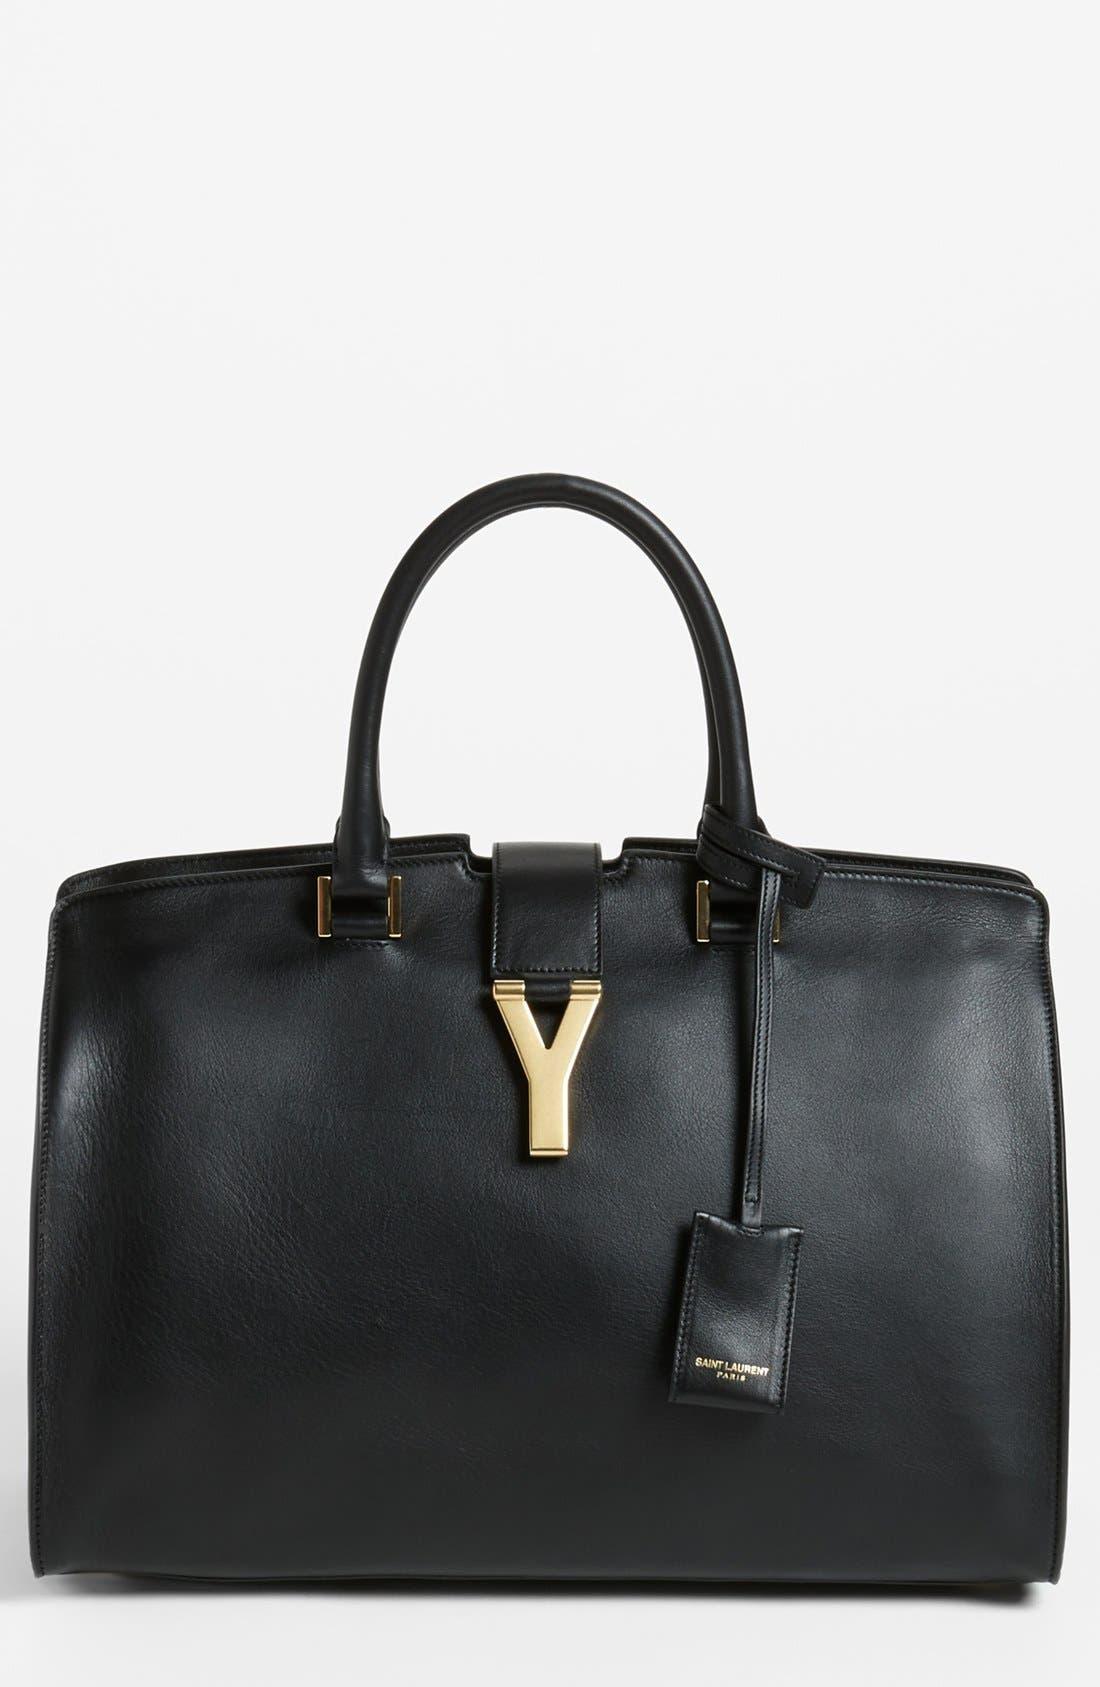 Alternate Image 1 Selected - Saint Laurent 'Ligne Y' Leather Satchel